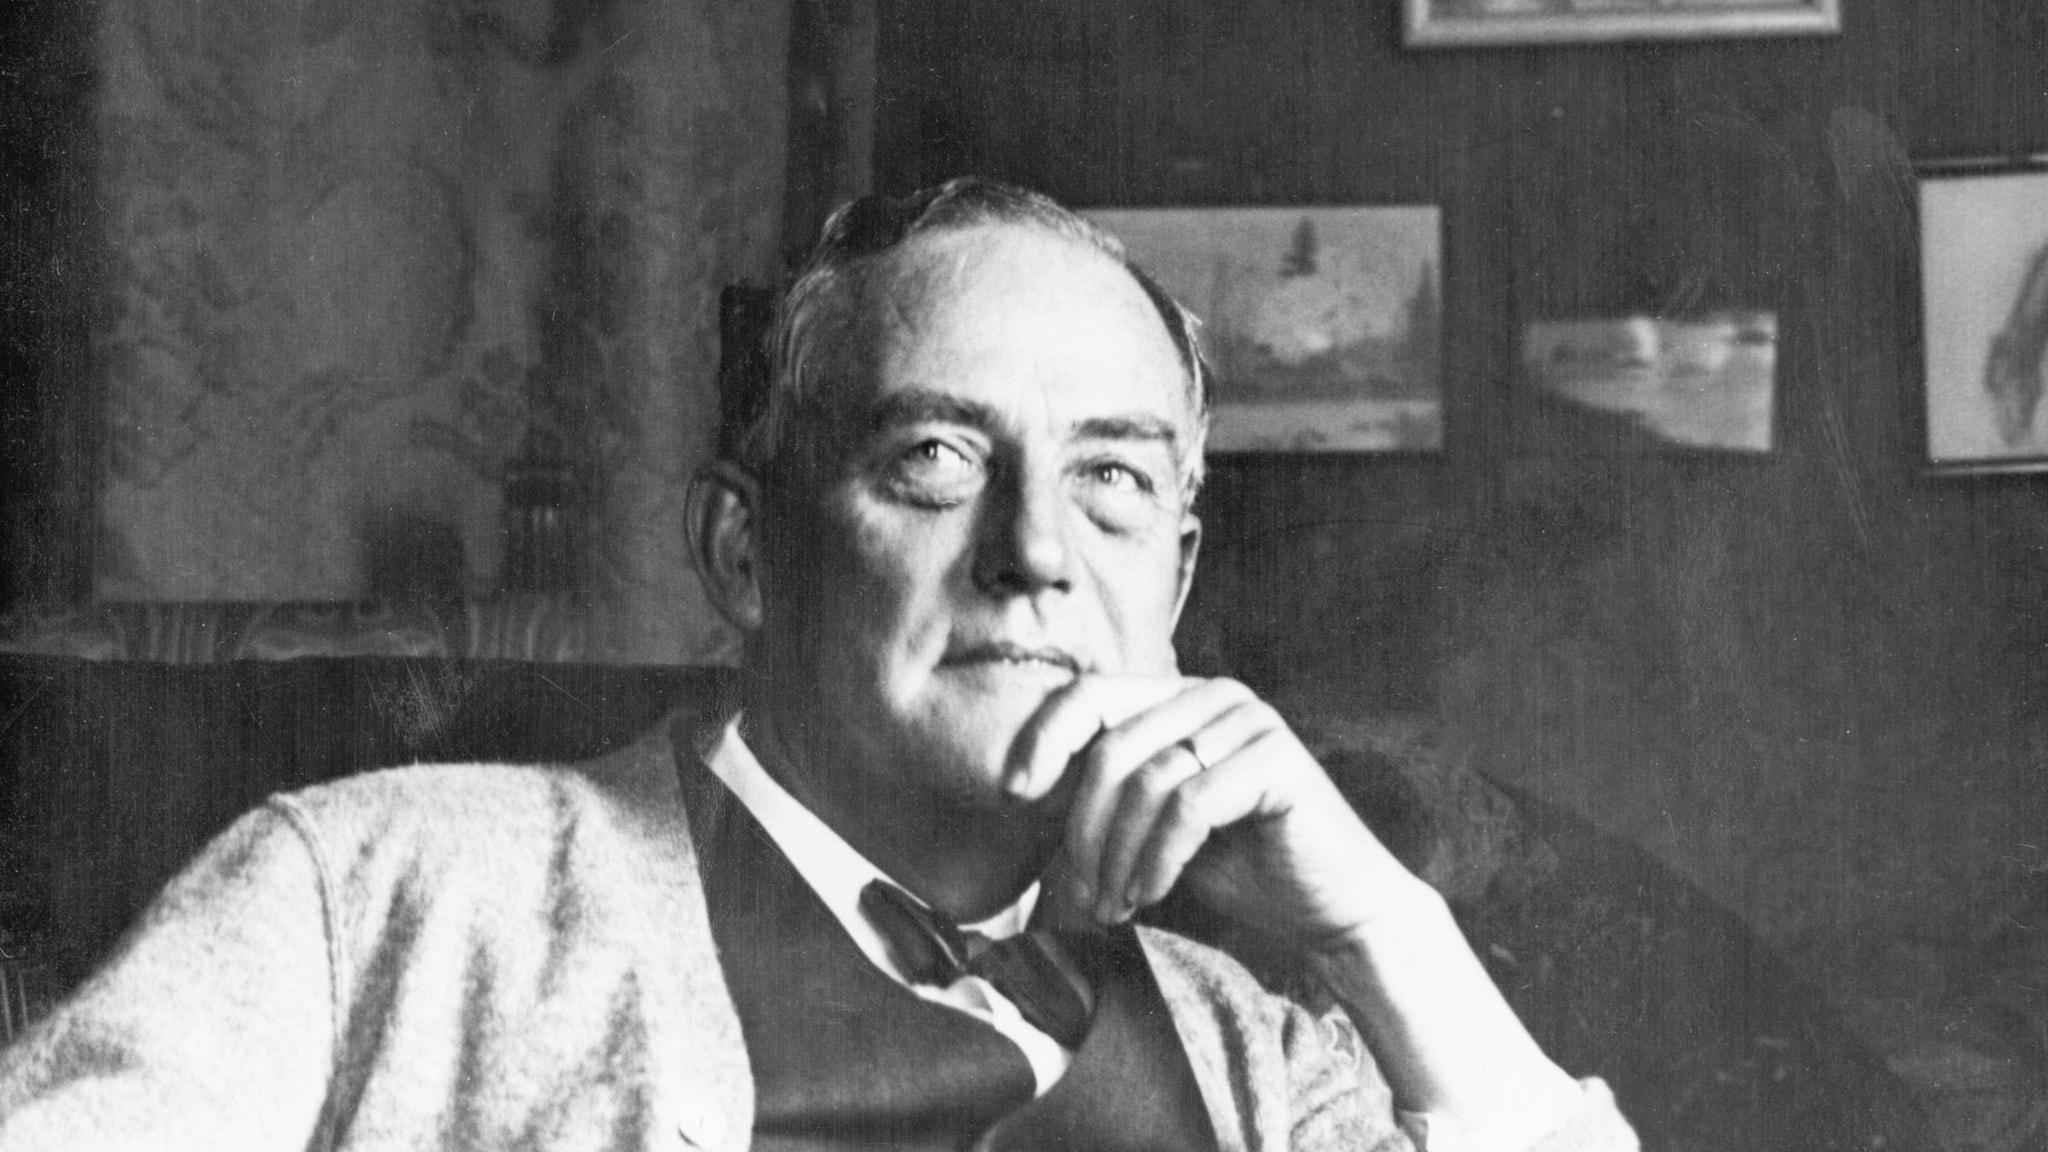 Victor Sjöström. SVT Bild.